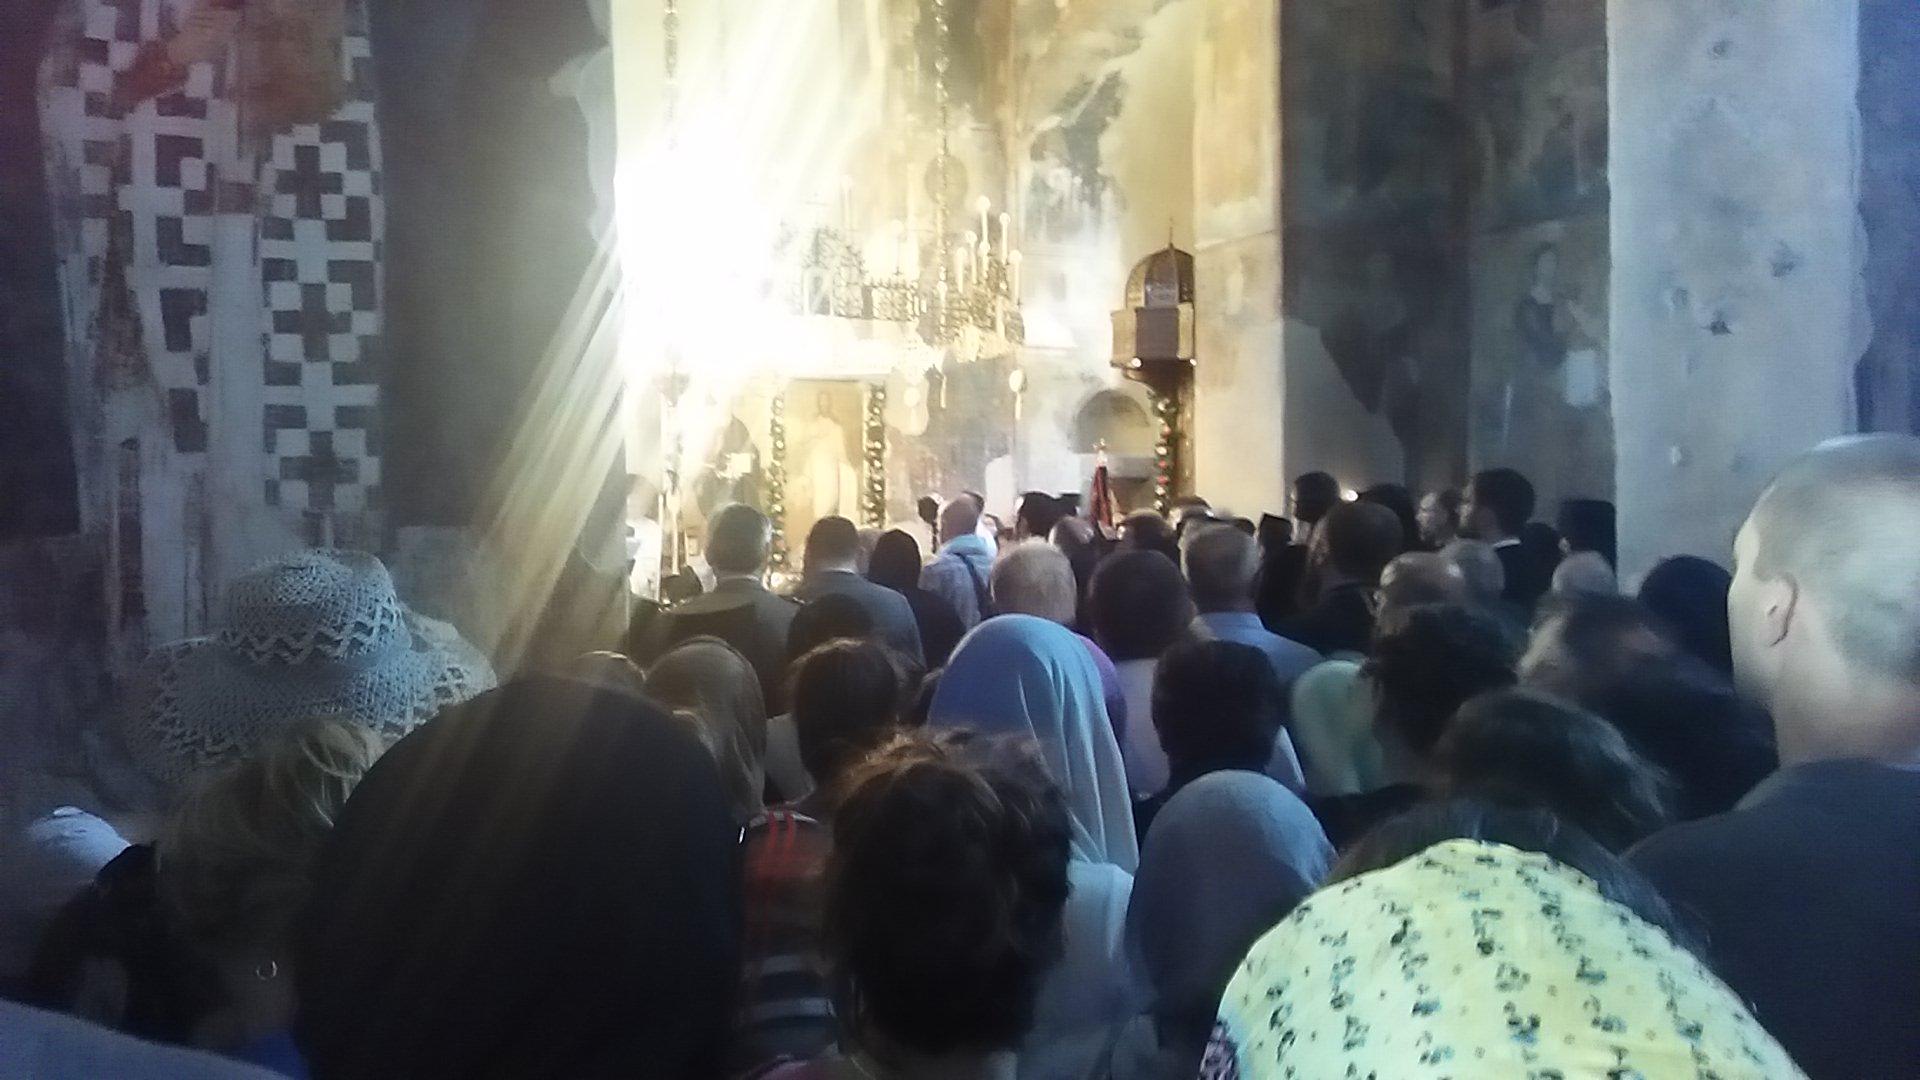 crkva služba